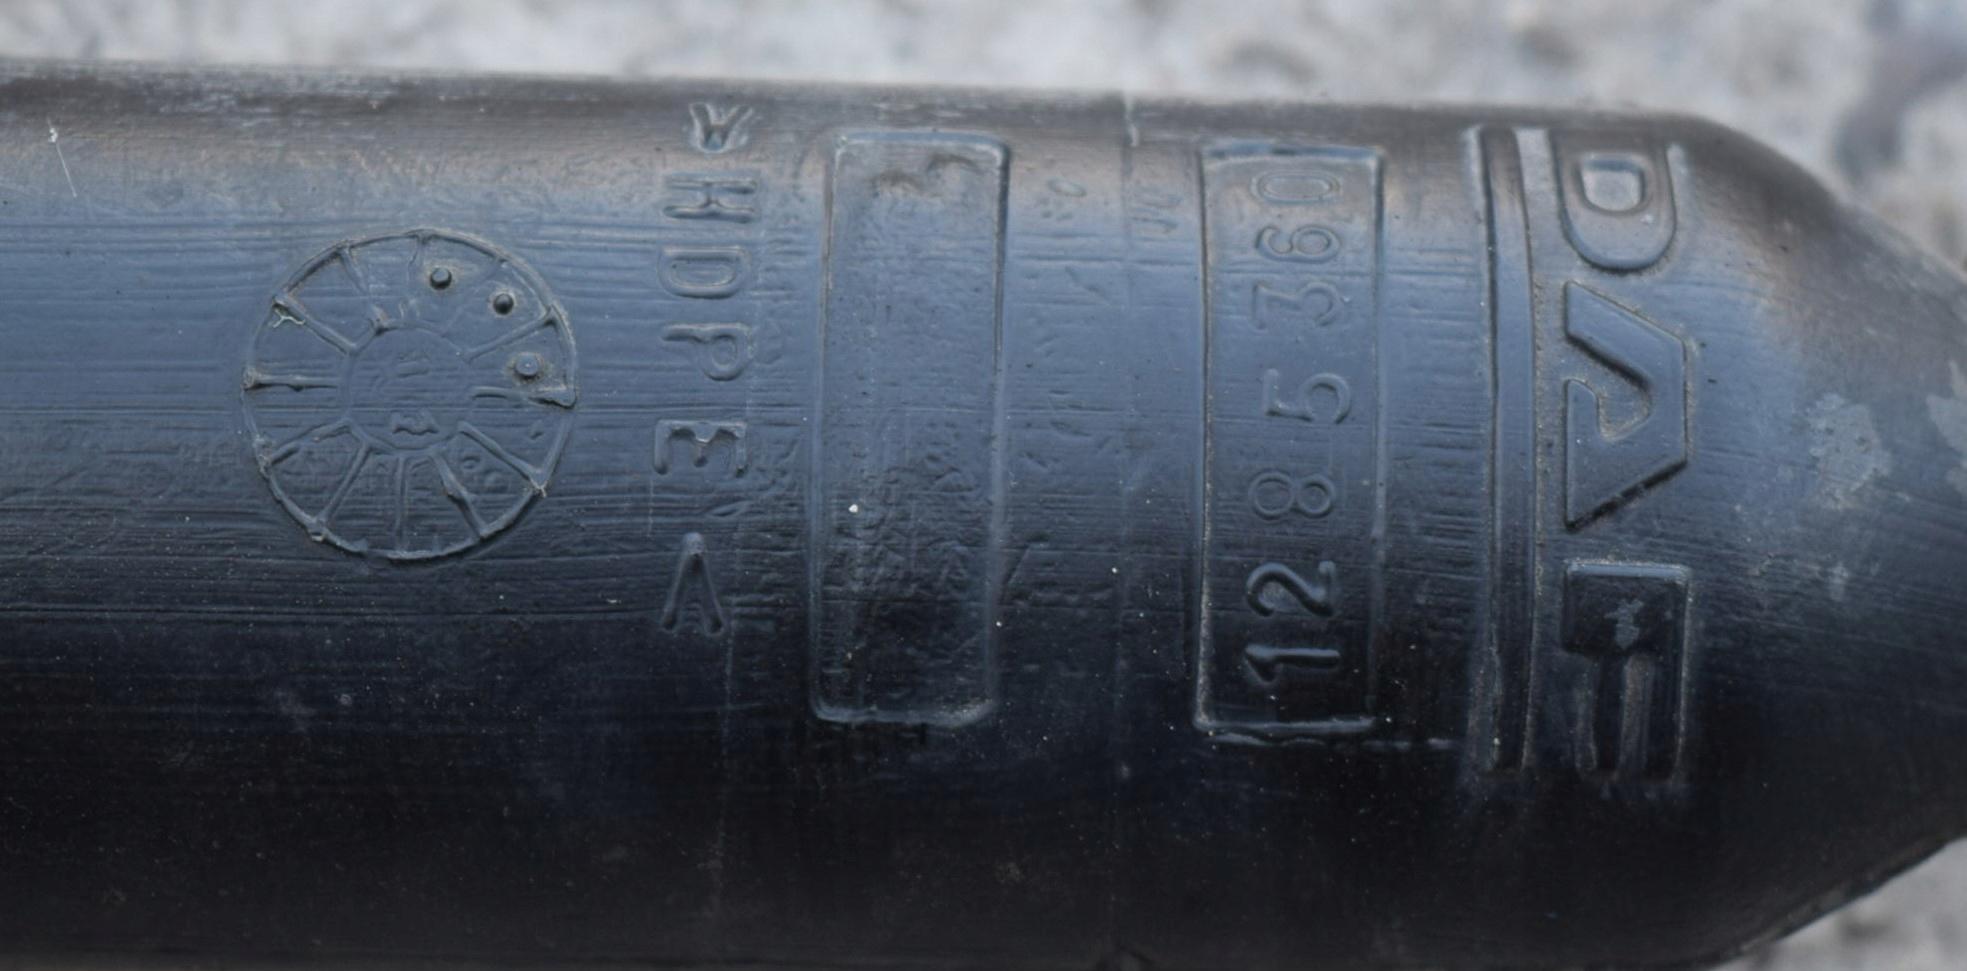 Picture of SERVOMOTOR LIFT CABIN DAF XF 105 NR. 1285360